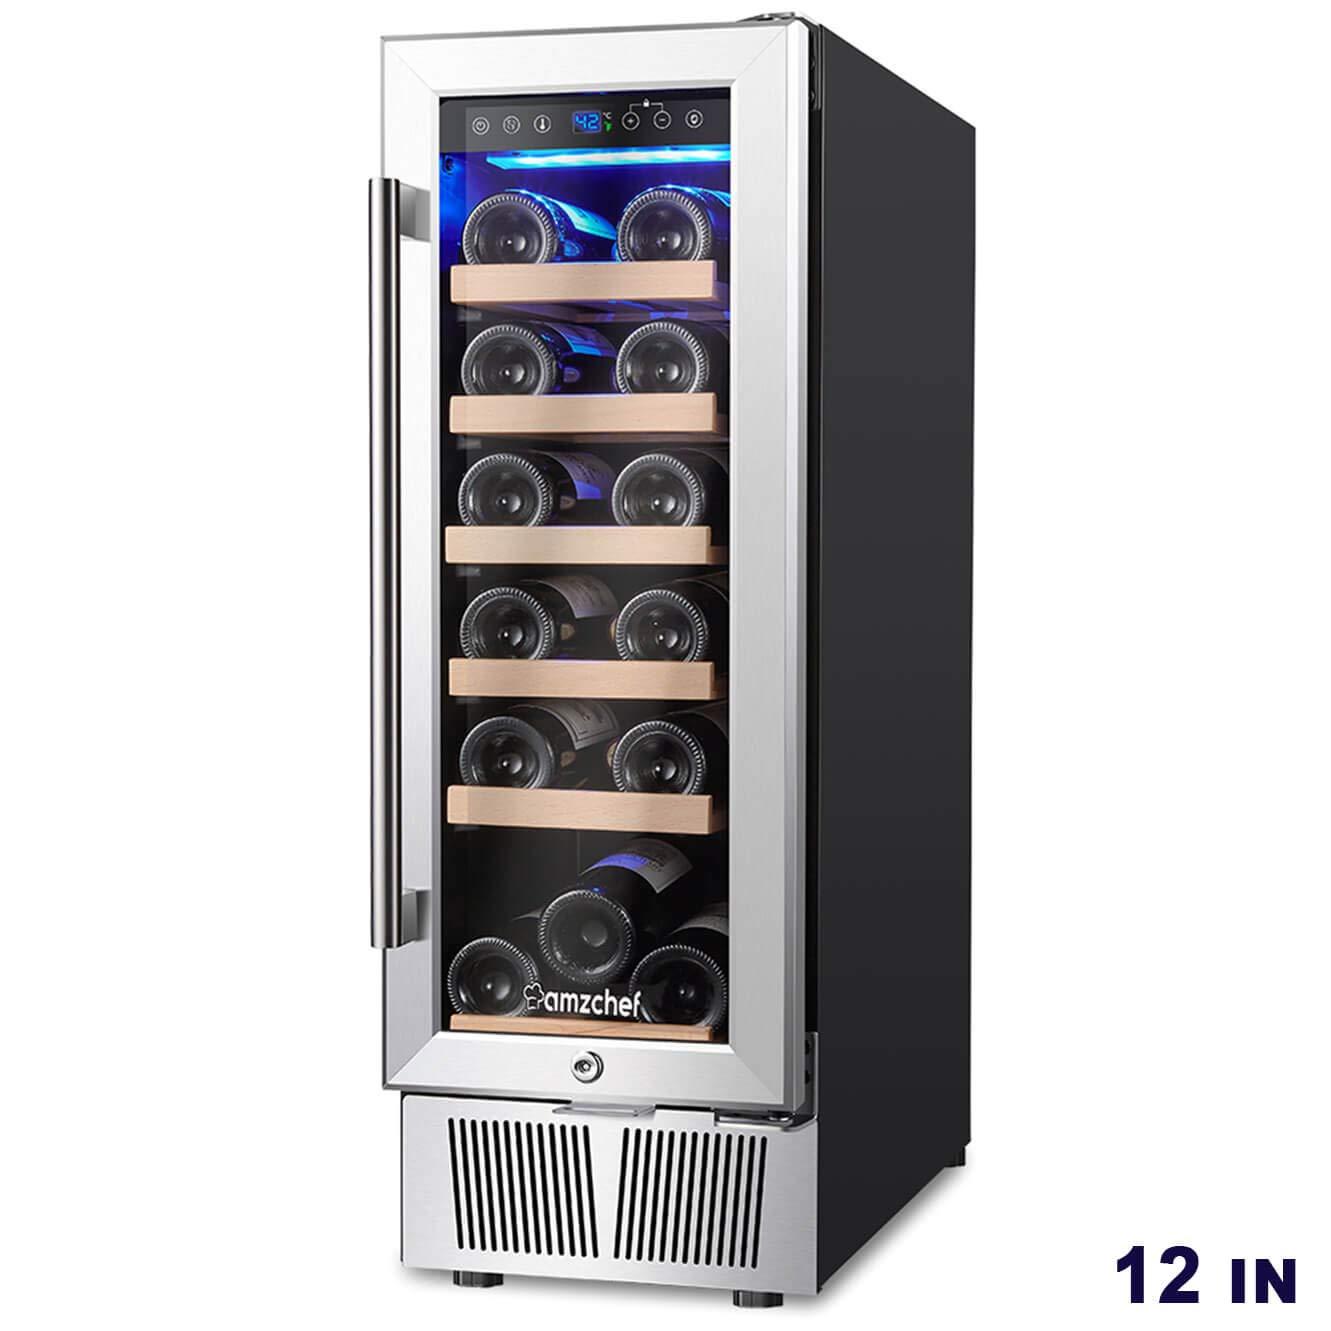 "AMZCHEF 12"" Wine Cooler, Wine Refrigerator Built-in or freestanding Quiet & Constant Temperature"